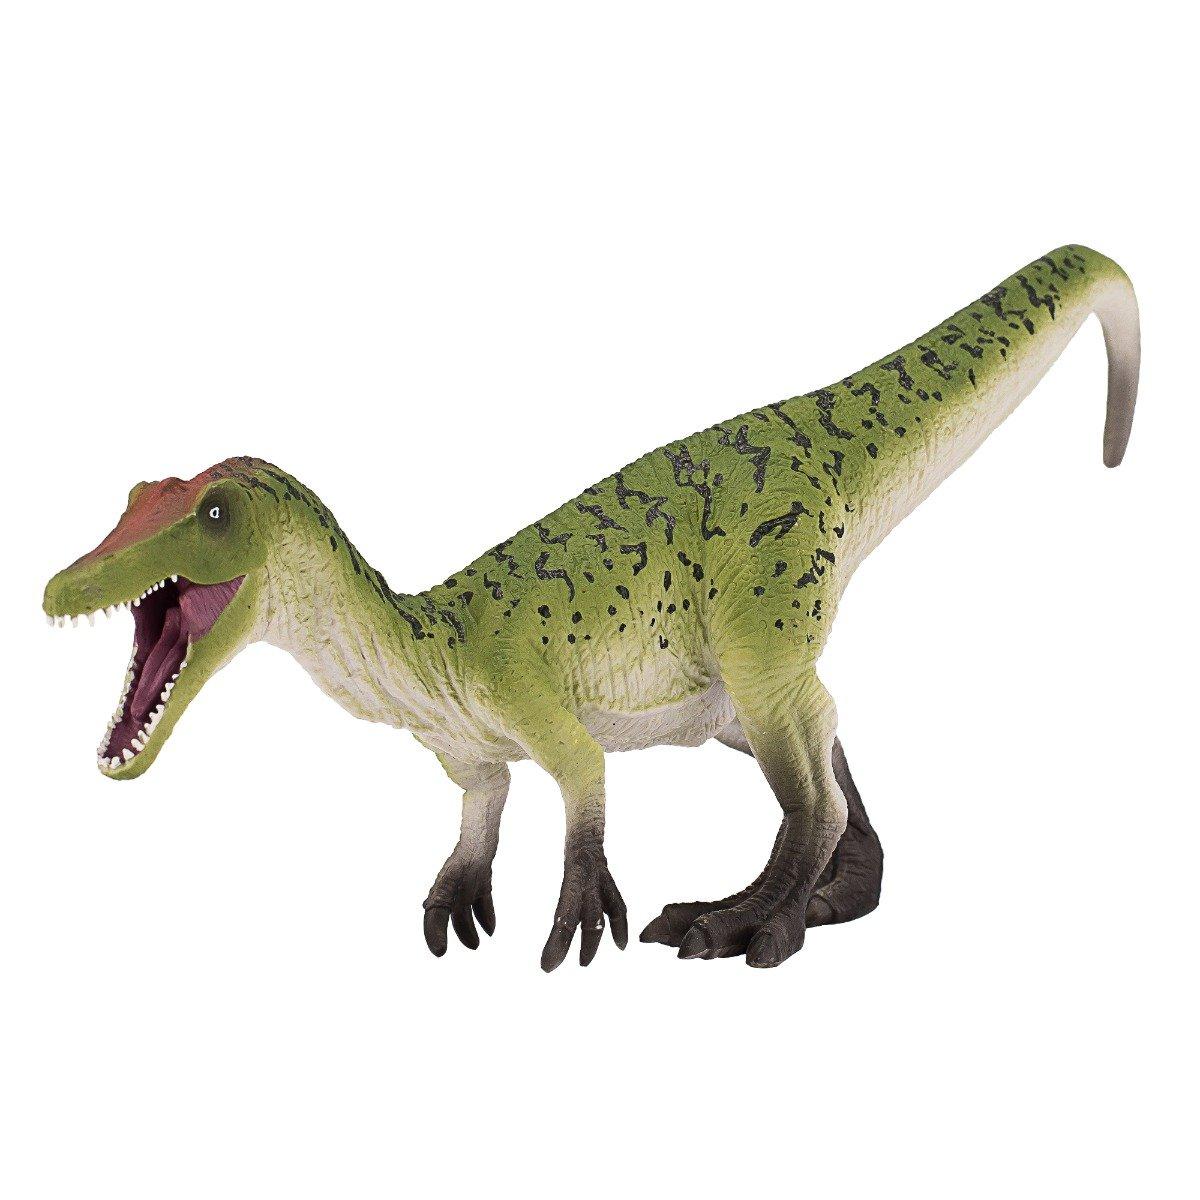 Figurina Mojo, Dinozaur Baryonyx cu maxilar articulat